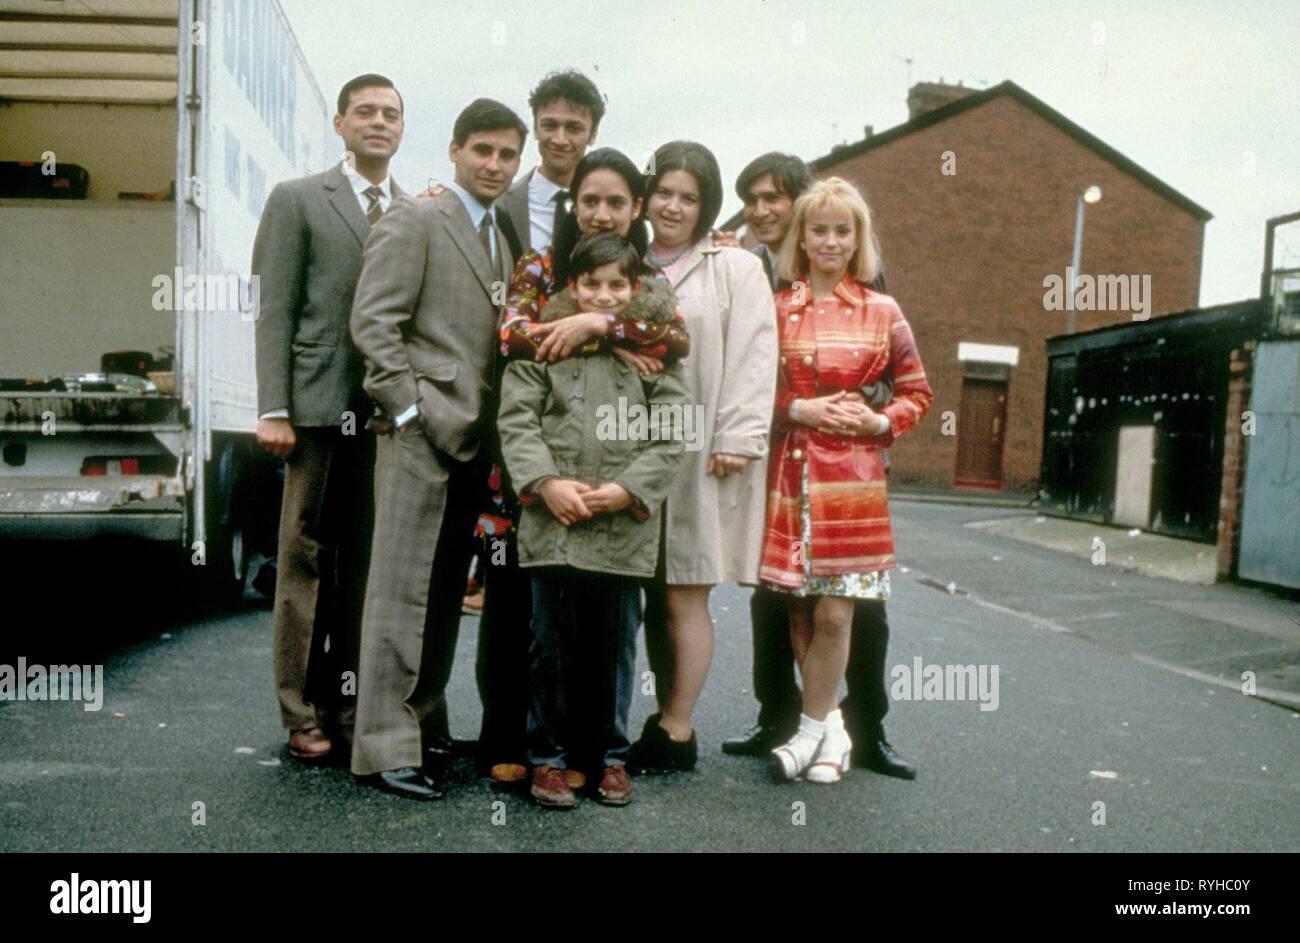 EMIL MARWA, RAJI JAMES, CHRIS BISSON, ARCHIE PANJABI, JORDAN ROUTLEDGE, RUTH JONES, JIMI MISTRY, EMMA RYDAL, EAST IS EAST, 1999 - Stock Image